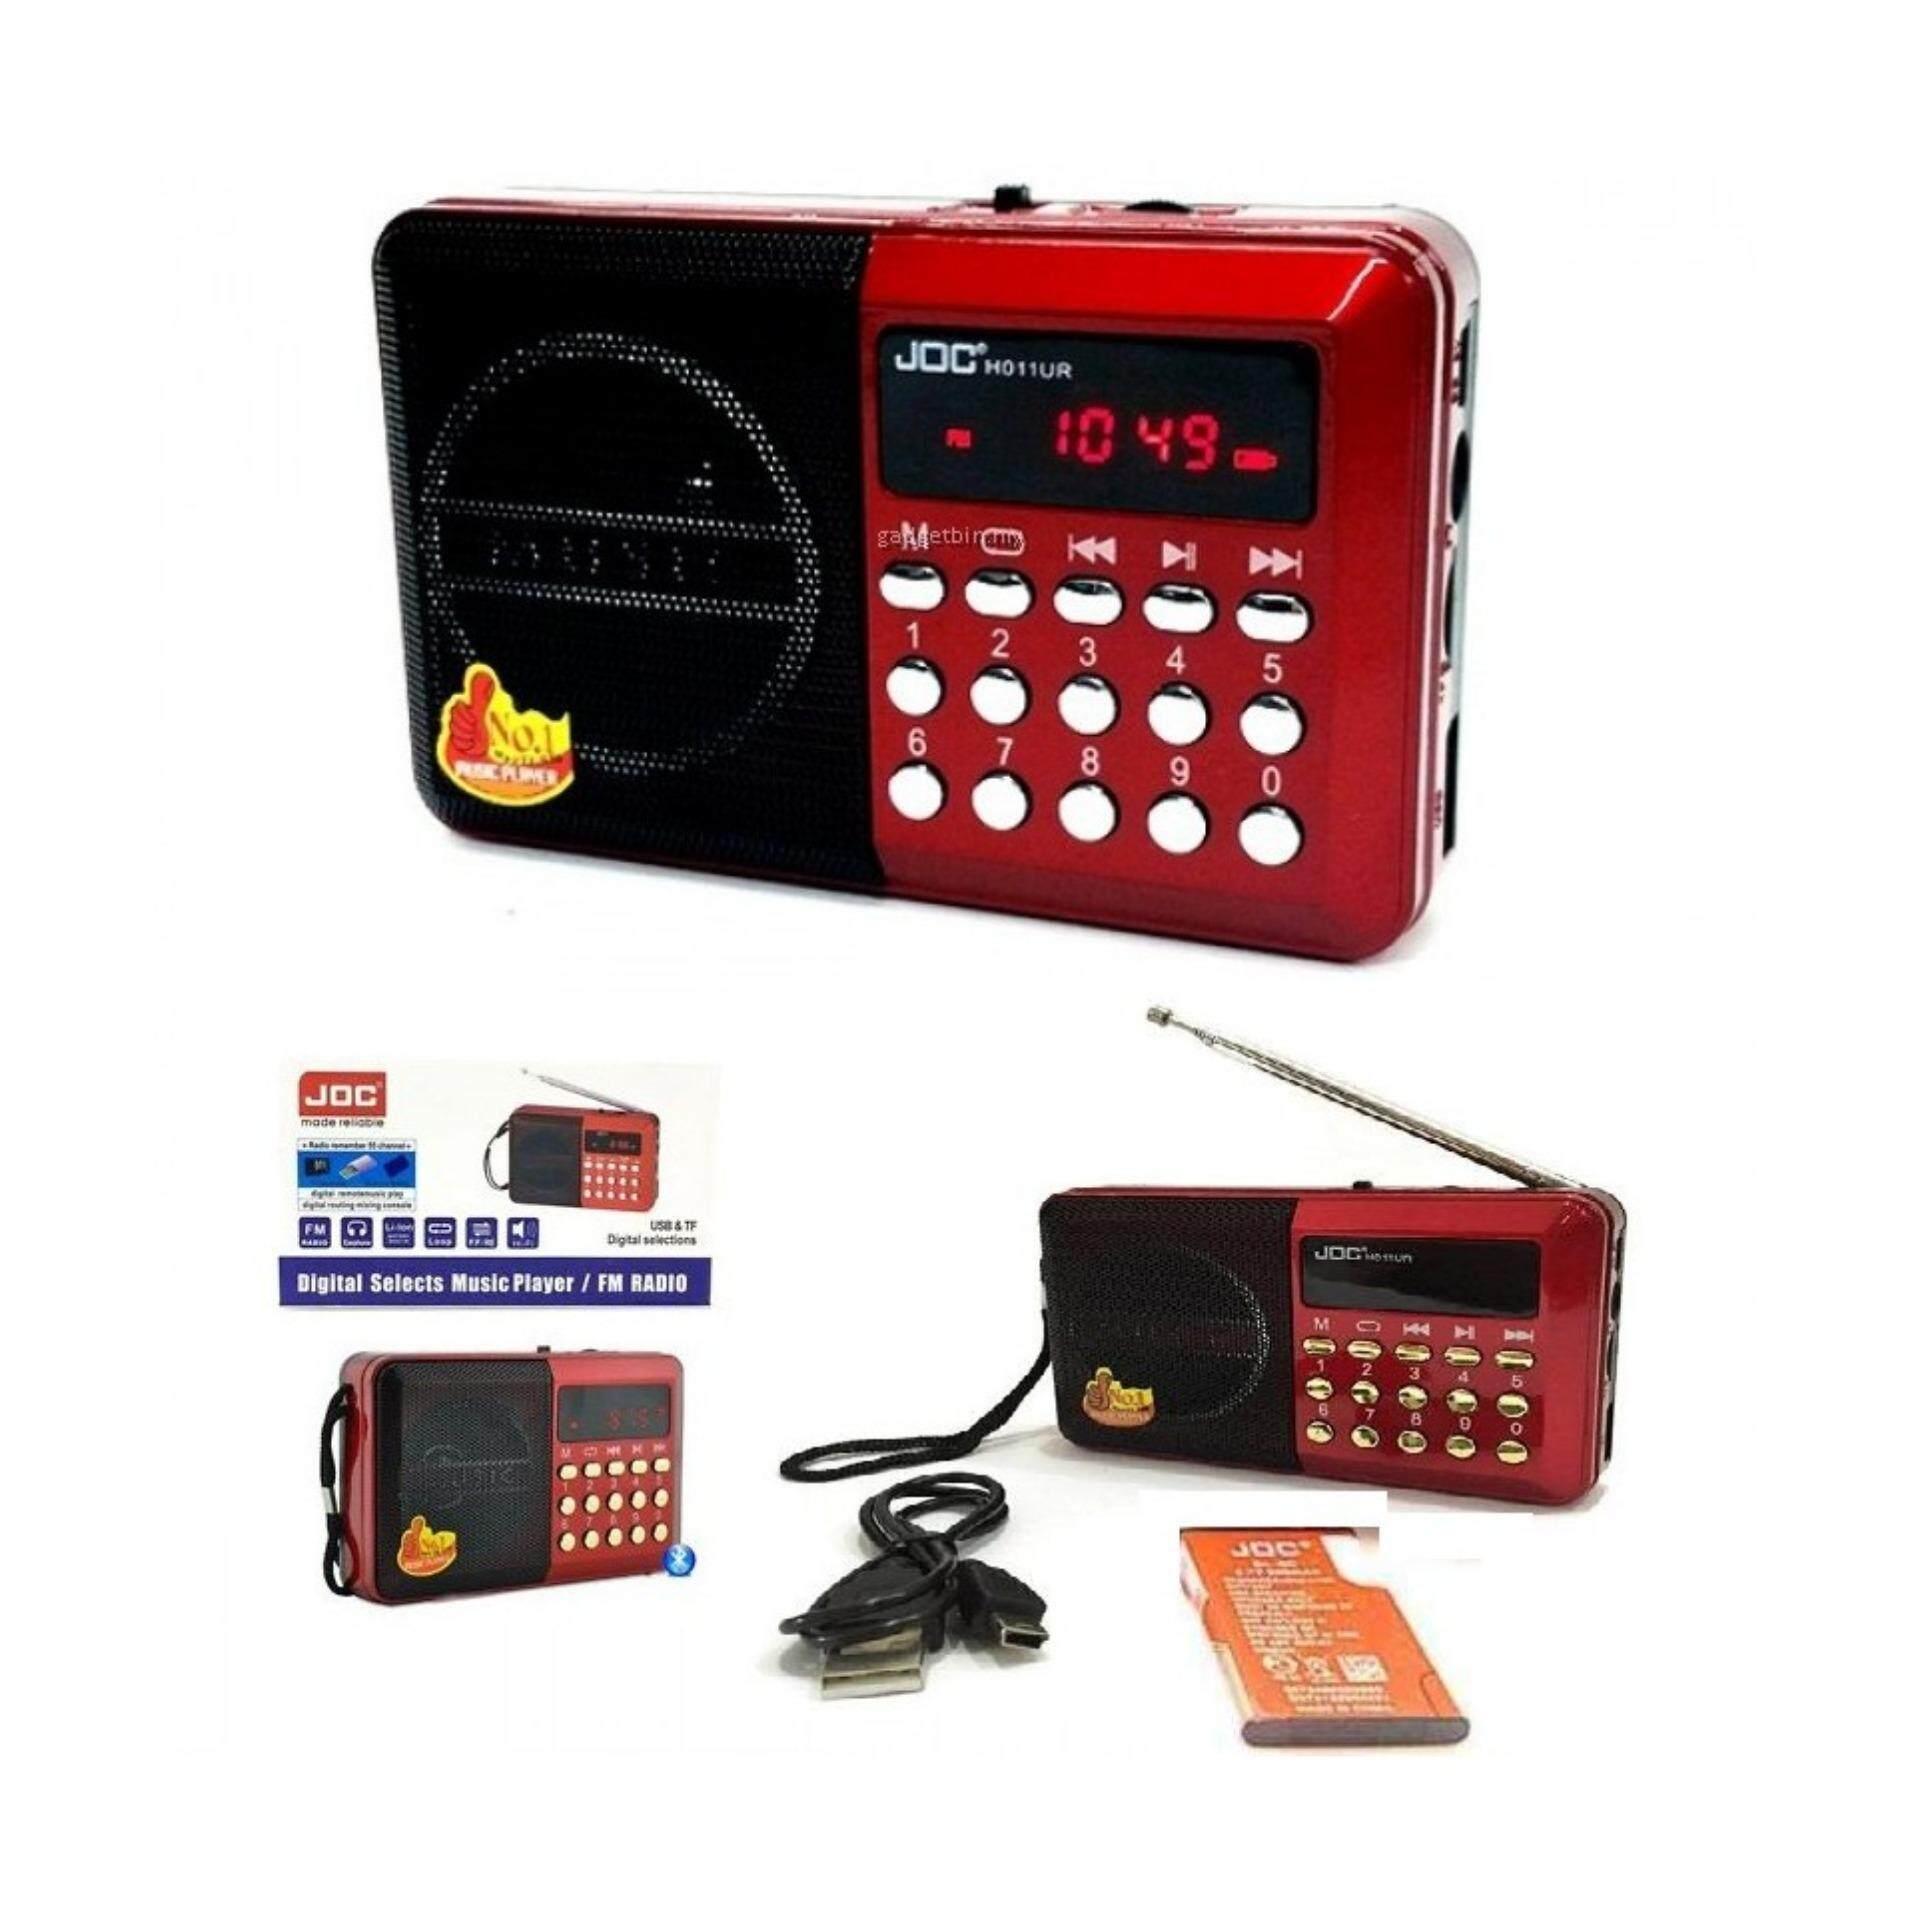 Juz Amma Dan Terjemahan Merah Daftar Update Harga Terbaru Perdana Axis Acak Jez Radio With Al Quran 30 Juzuk Joc Rechargeable Usb And Microsd 4gb Slot Mini Digital Mp3